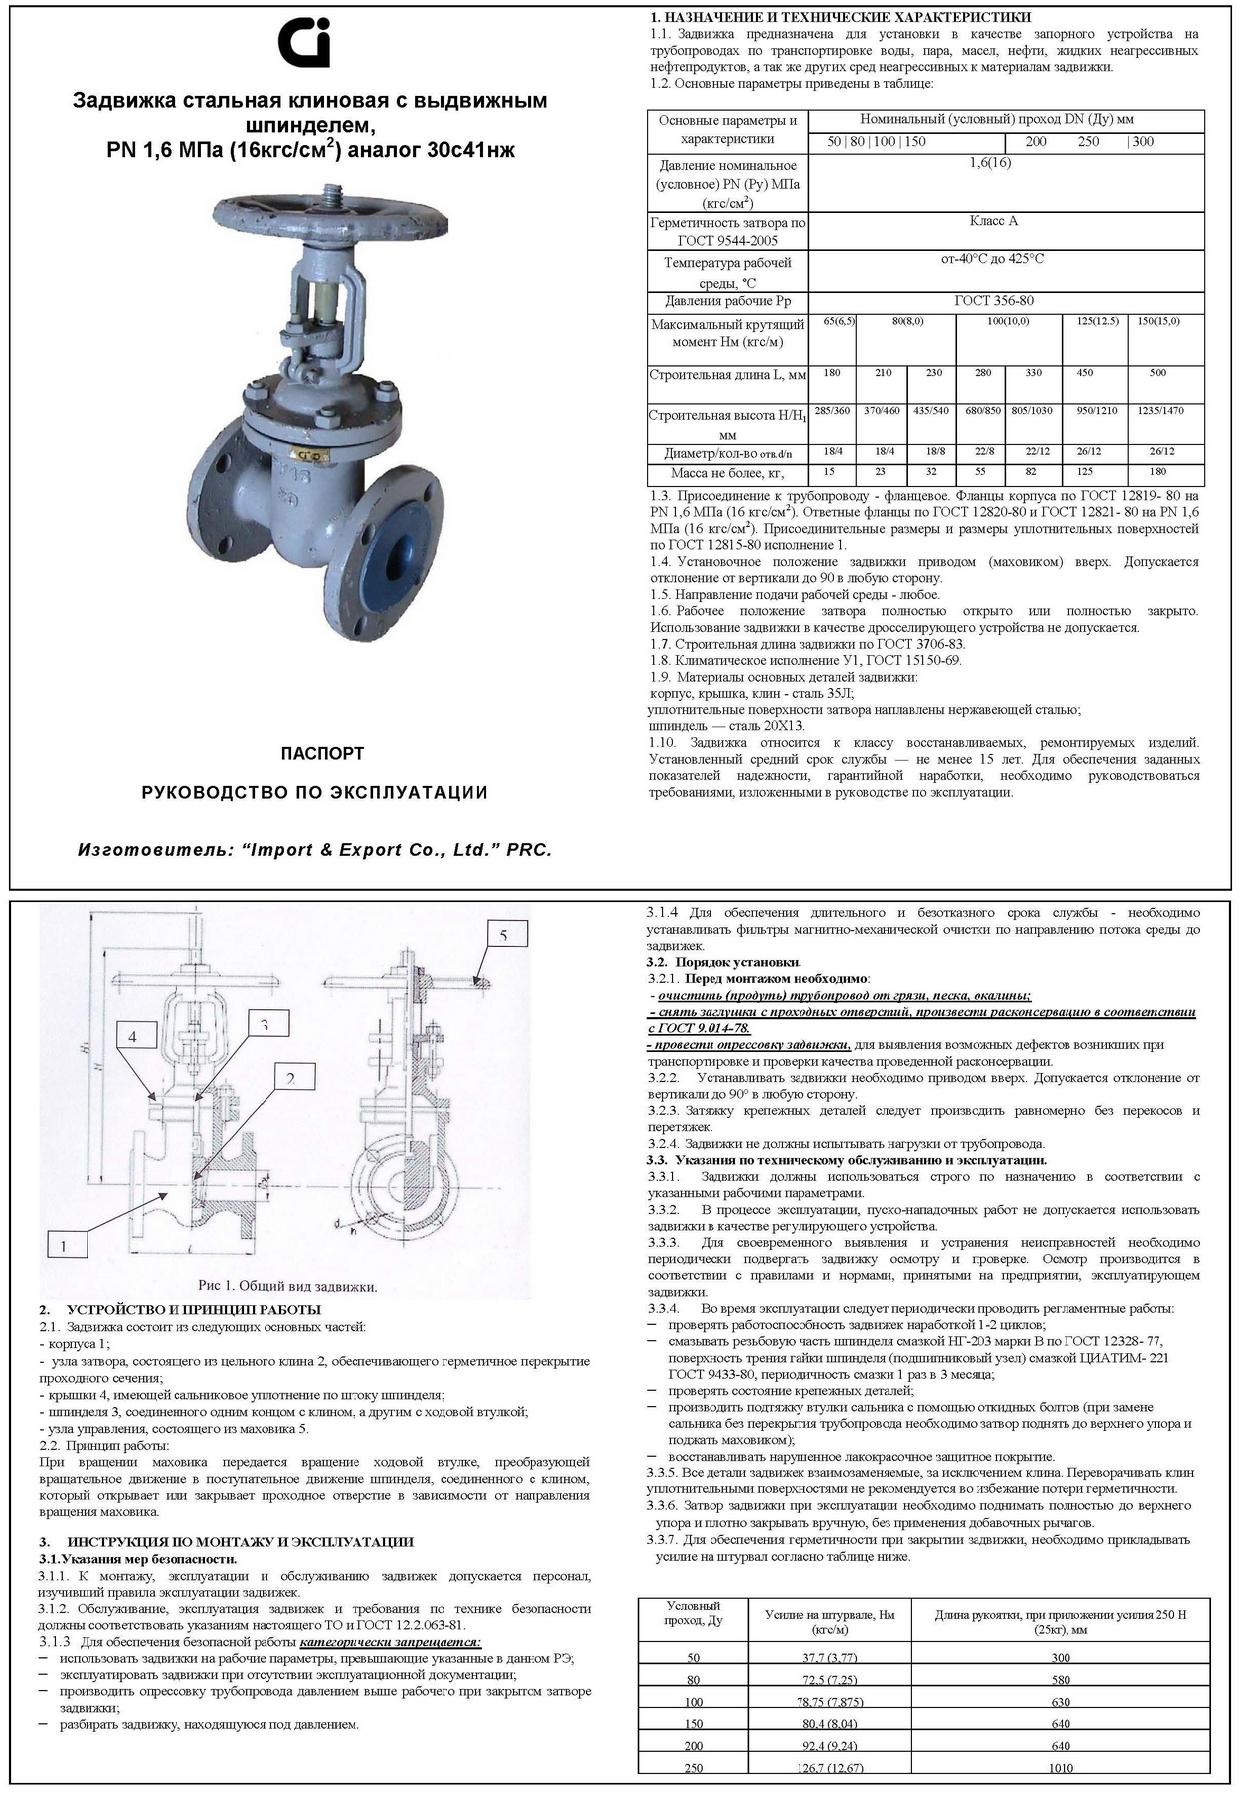 Задвижка ЗКЛ2 80-40Мнж